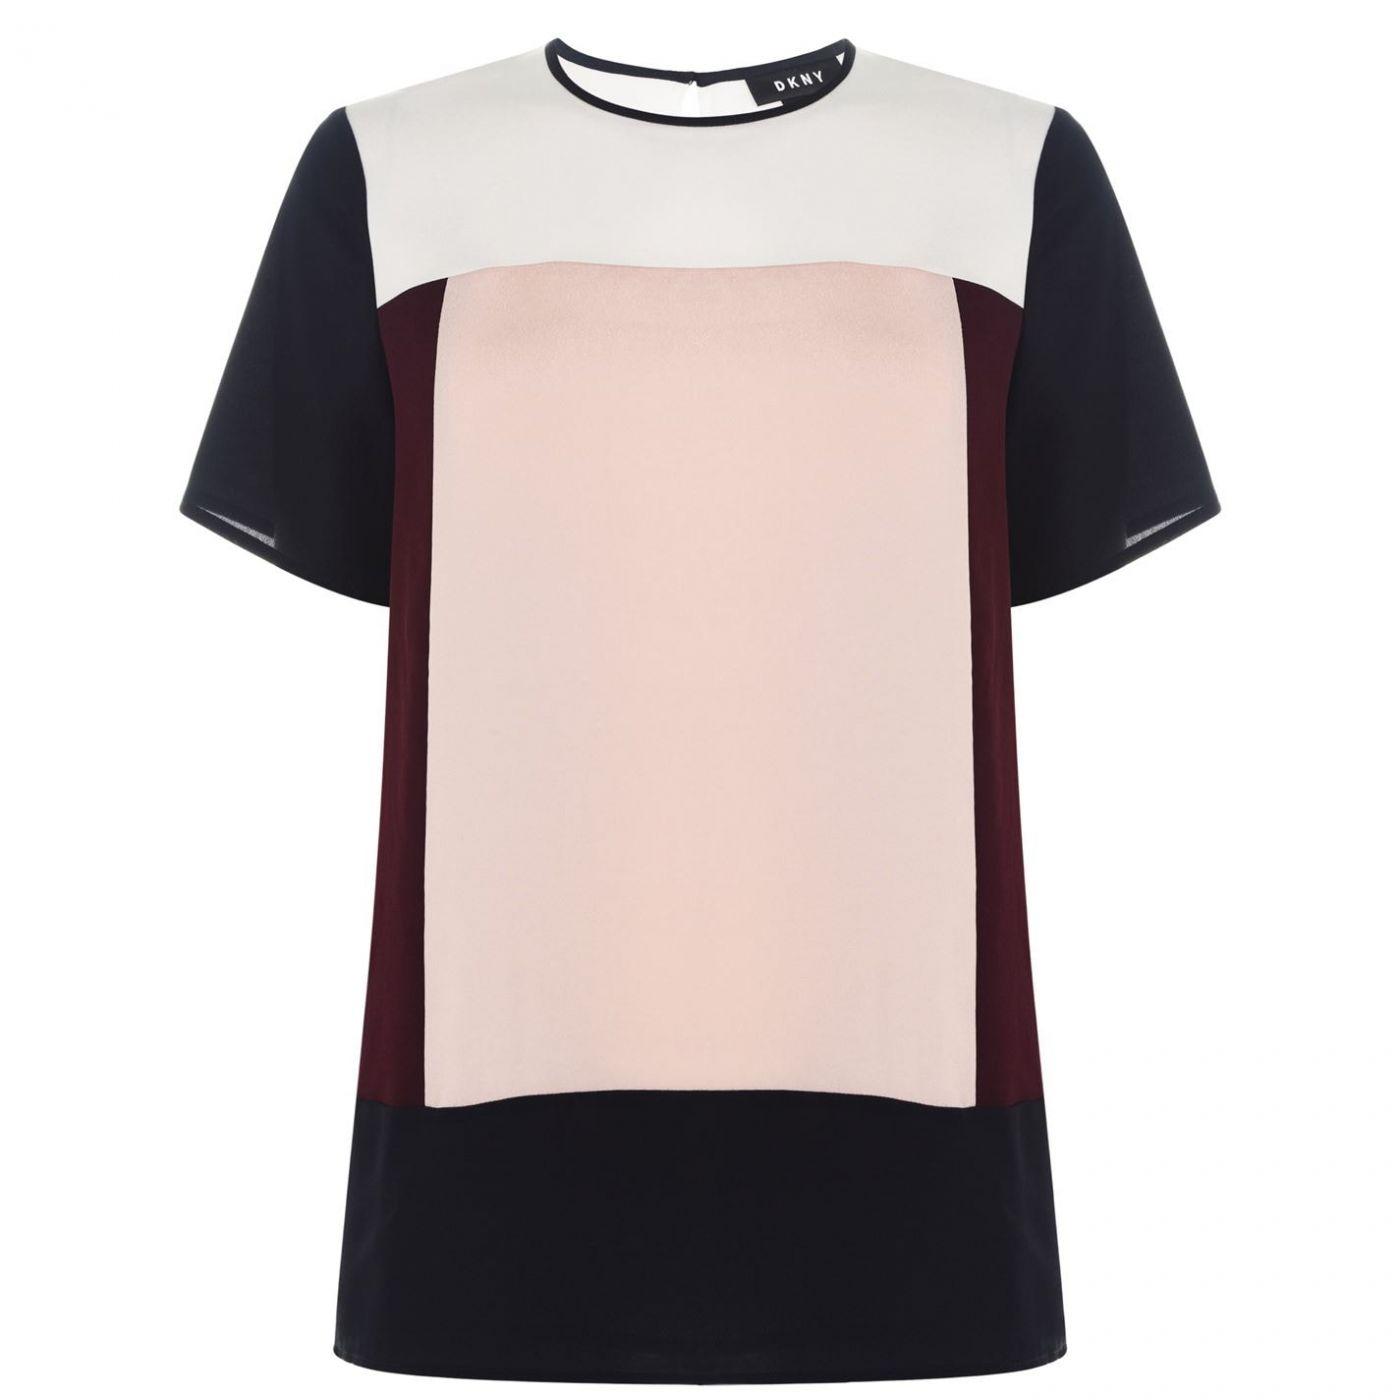 DKNY Short Sleeve Colour Block T Shirt